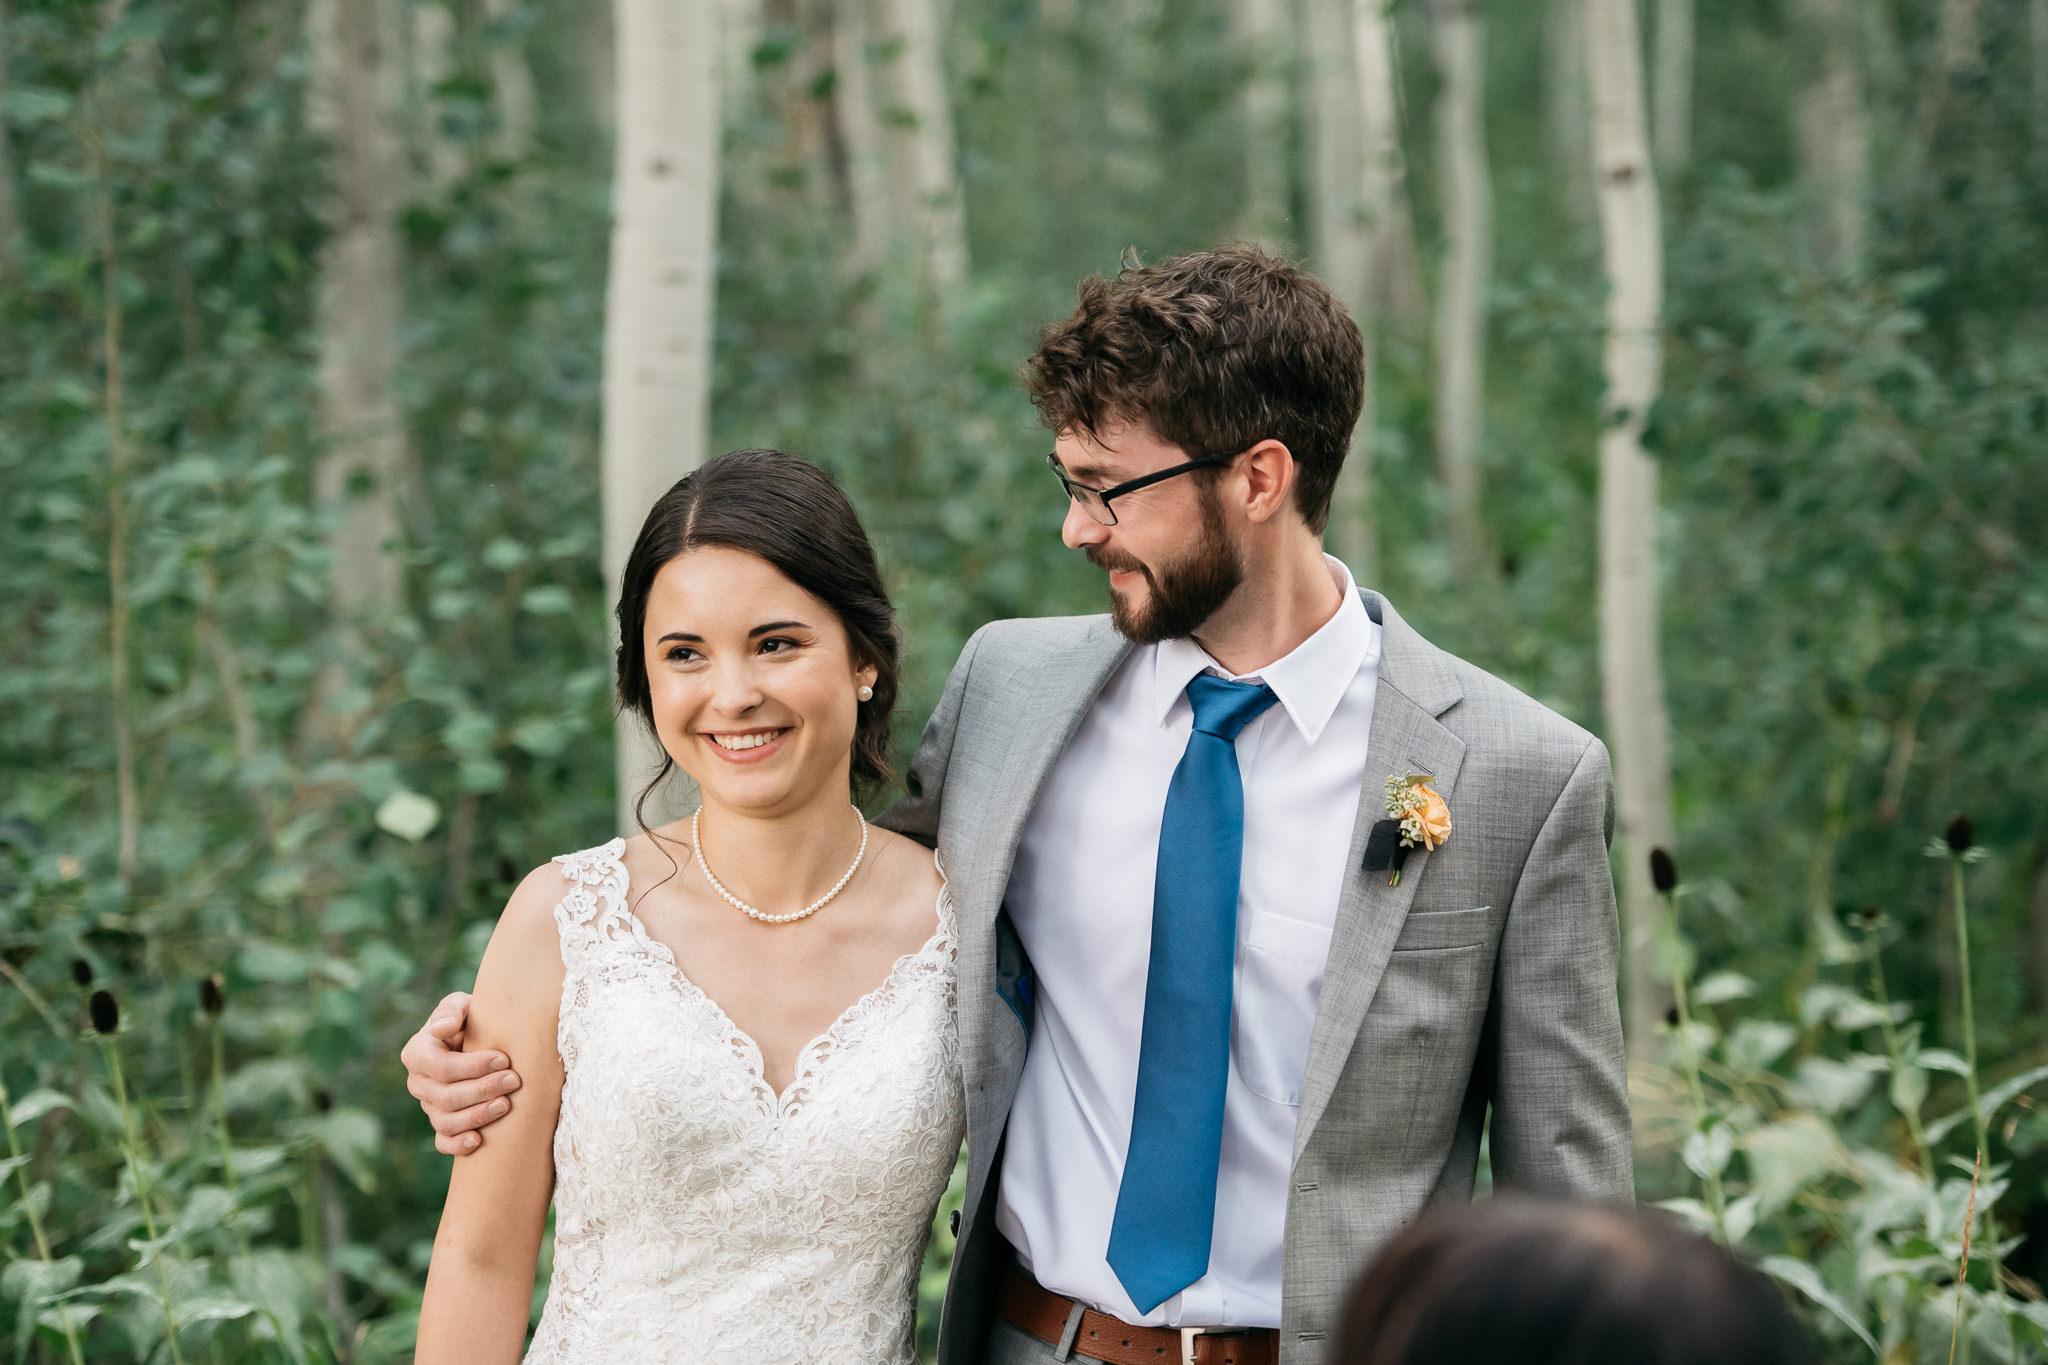 526_ONL_Kat_Nick_Wedding_Trevor_Hooper_Photo.jpg